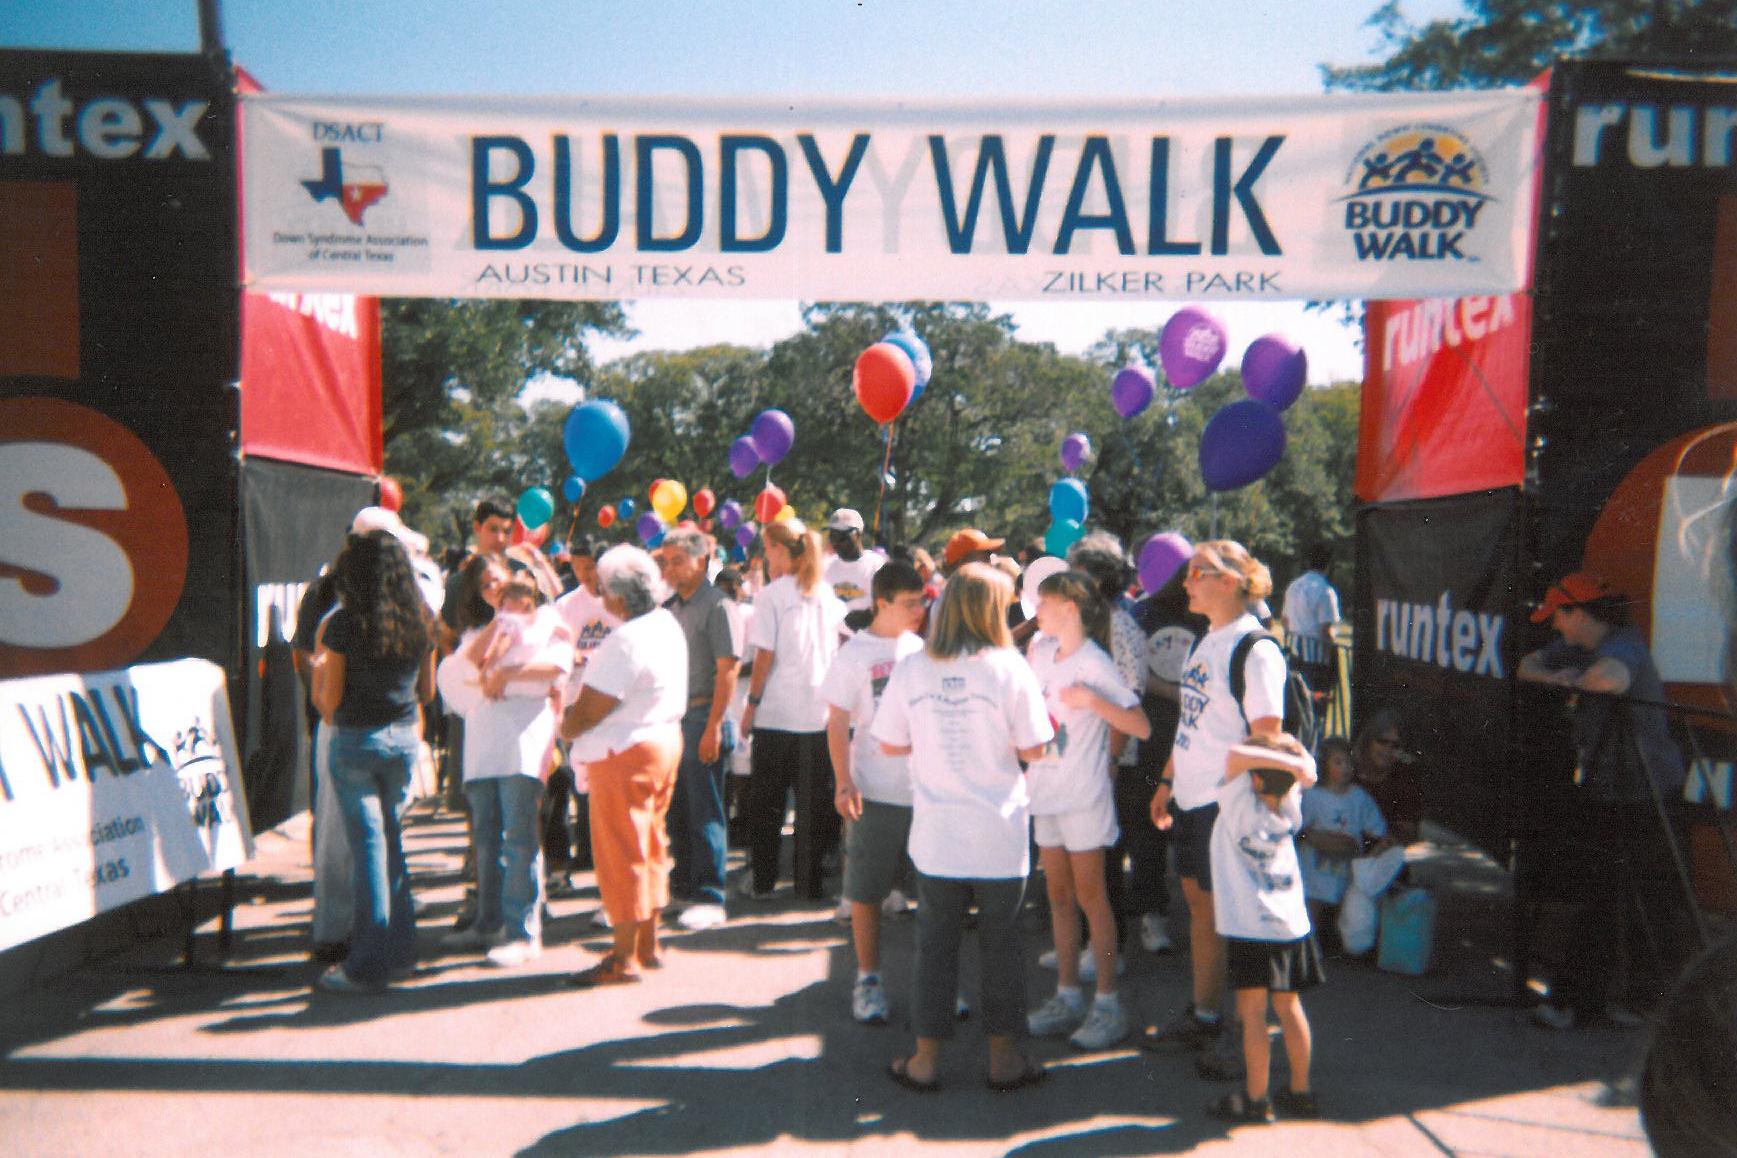 Buddy Walk 2003 - Zilker 3.jpg